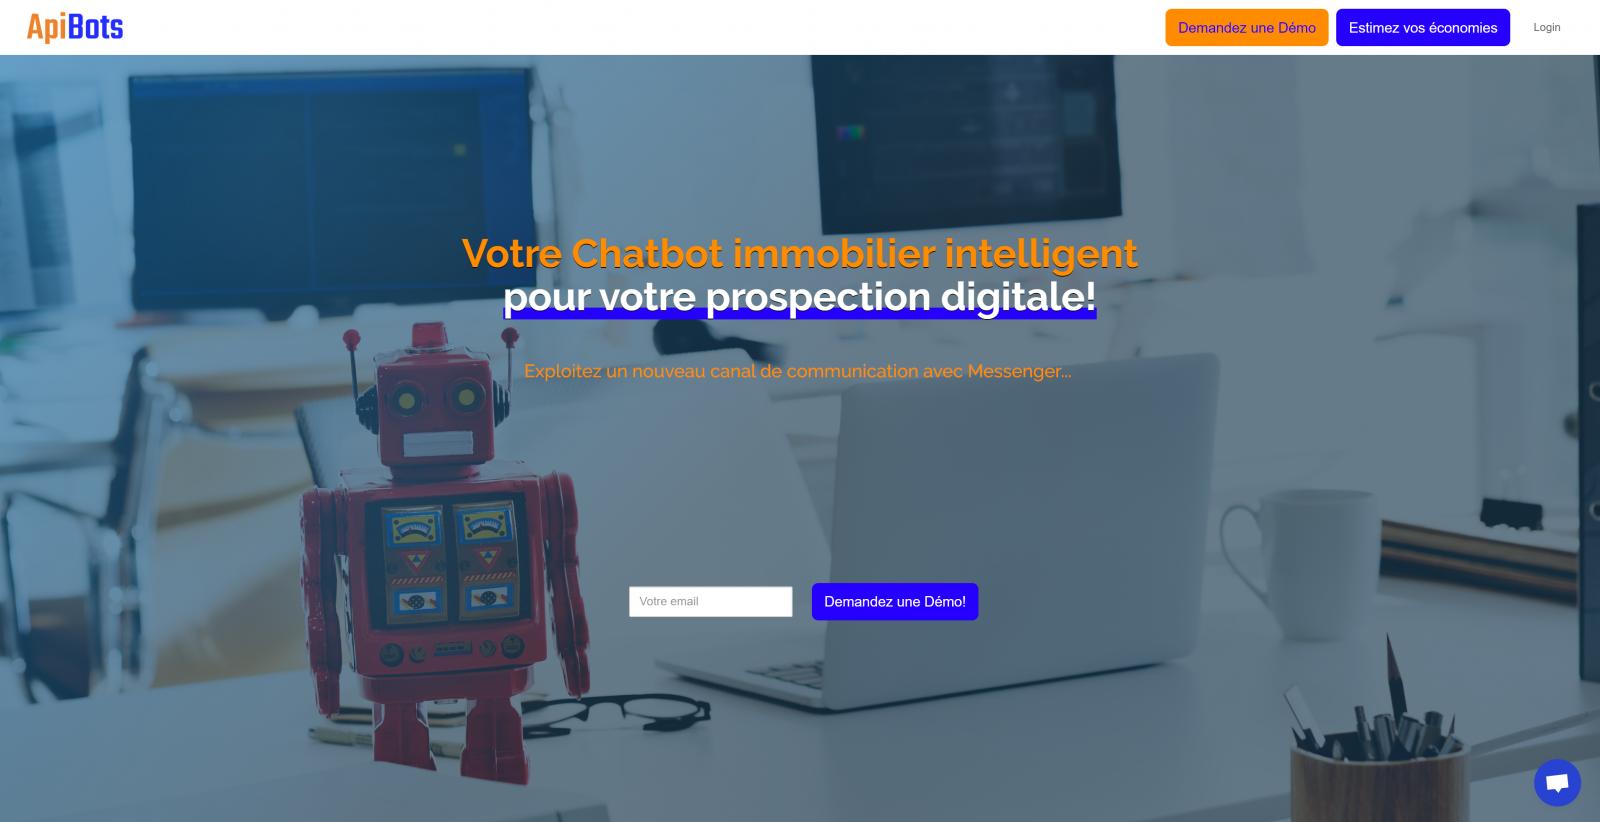 Apibots Chatbot Immobilier Intelligent 1